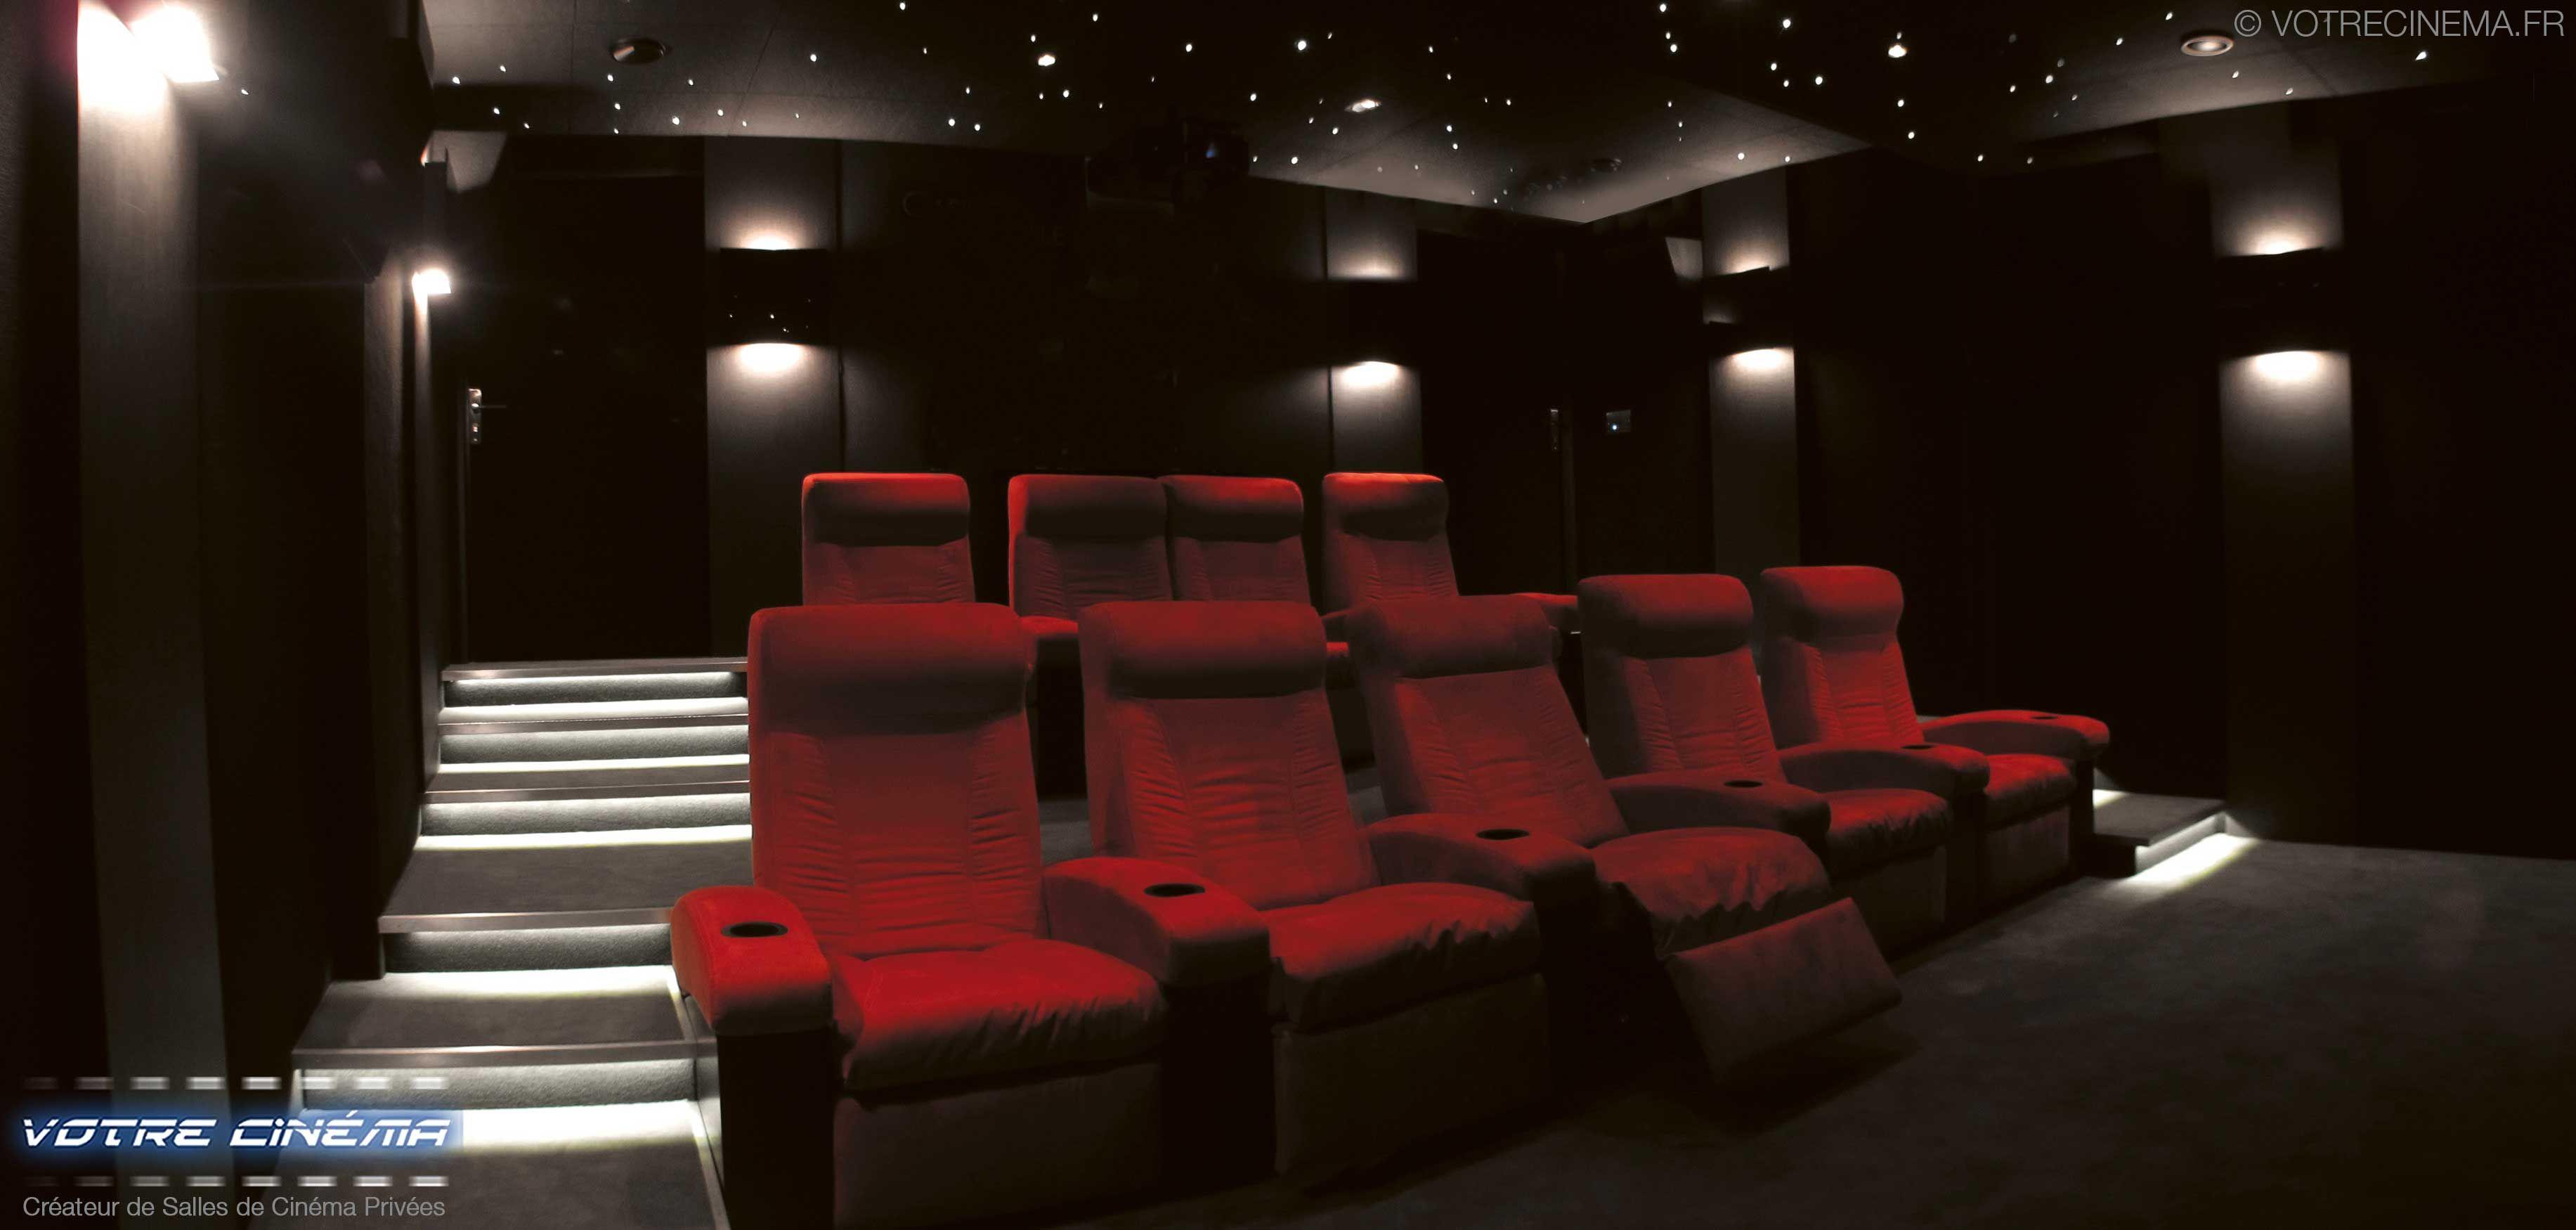 Epingle Sur Cinema